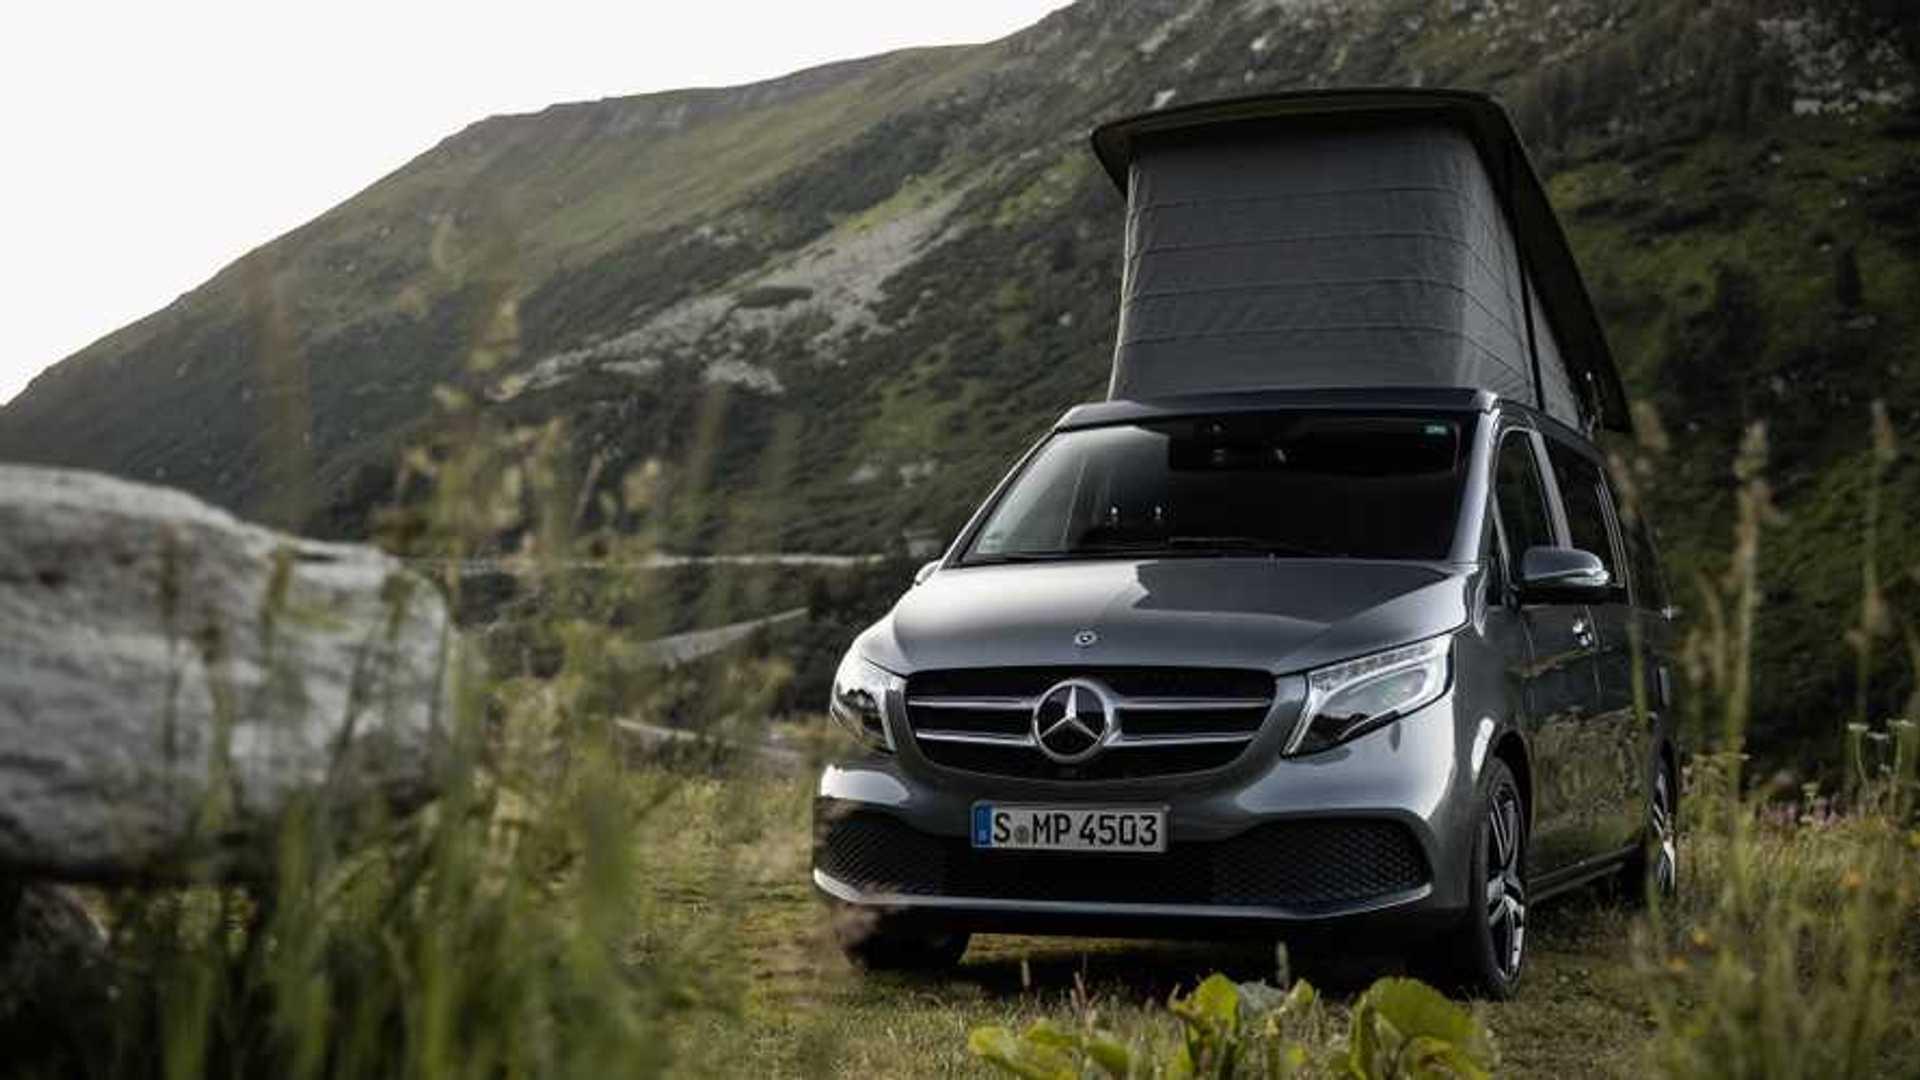 Mercedes a Parma, anteprima del nuovo Marco Polo Horizon